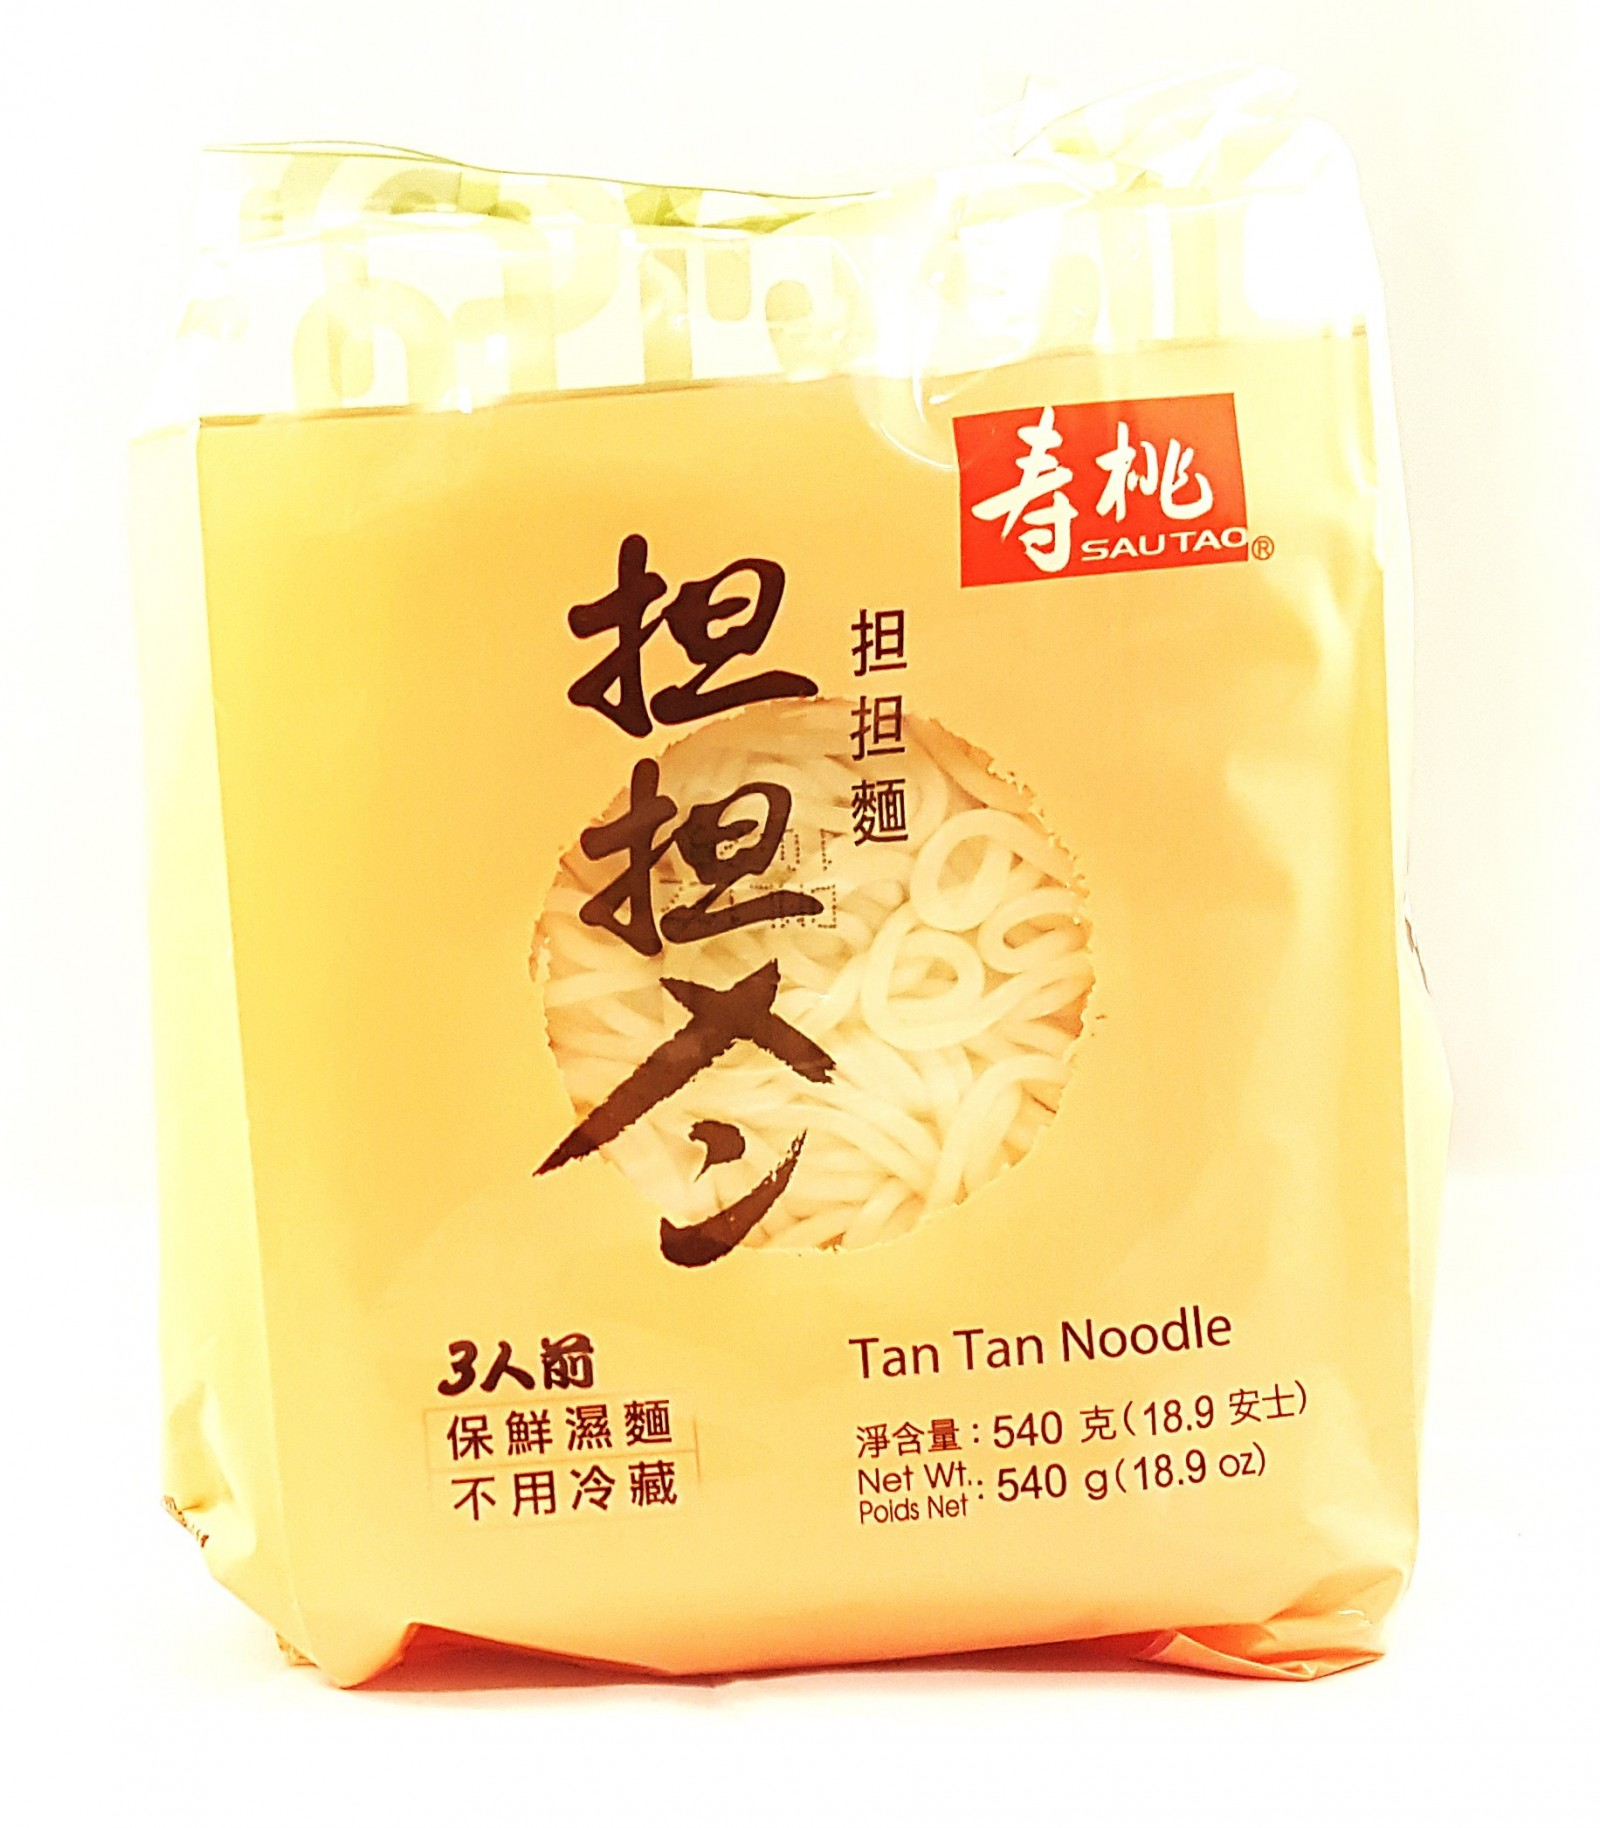 SAU TAO Tan Tan Noodle 540g - Sing Kee